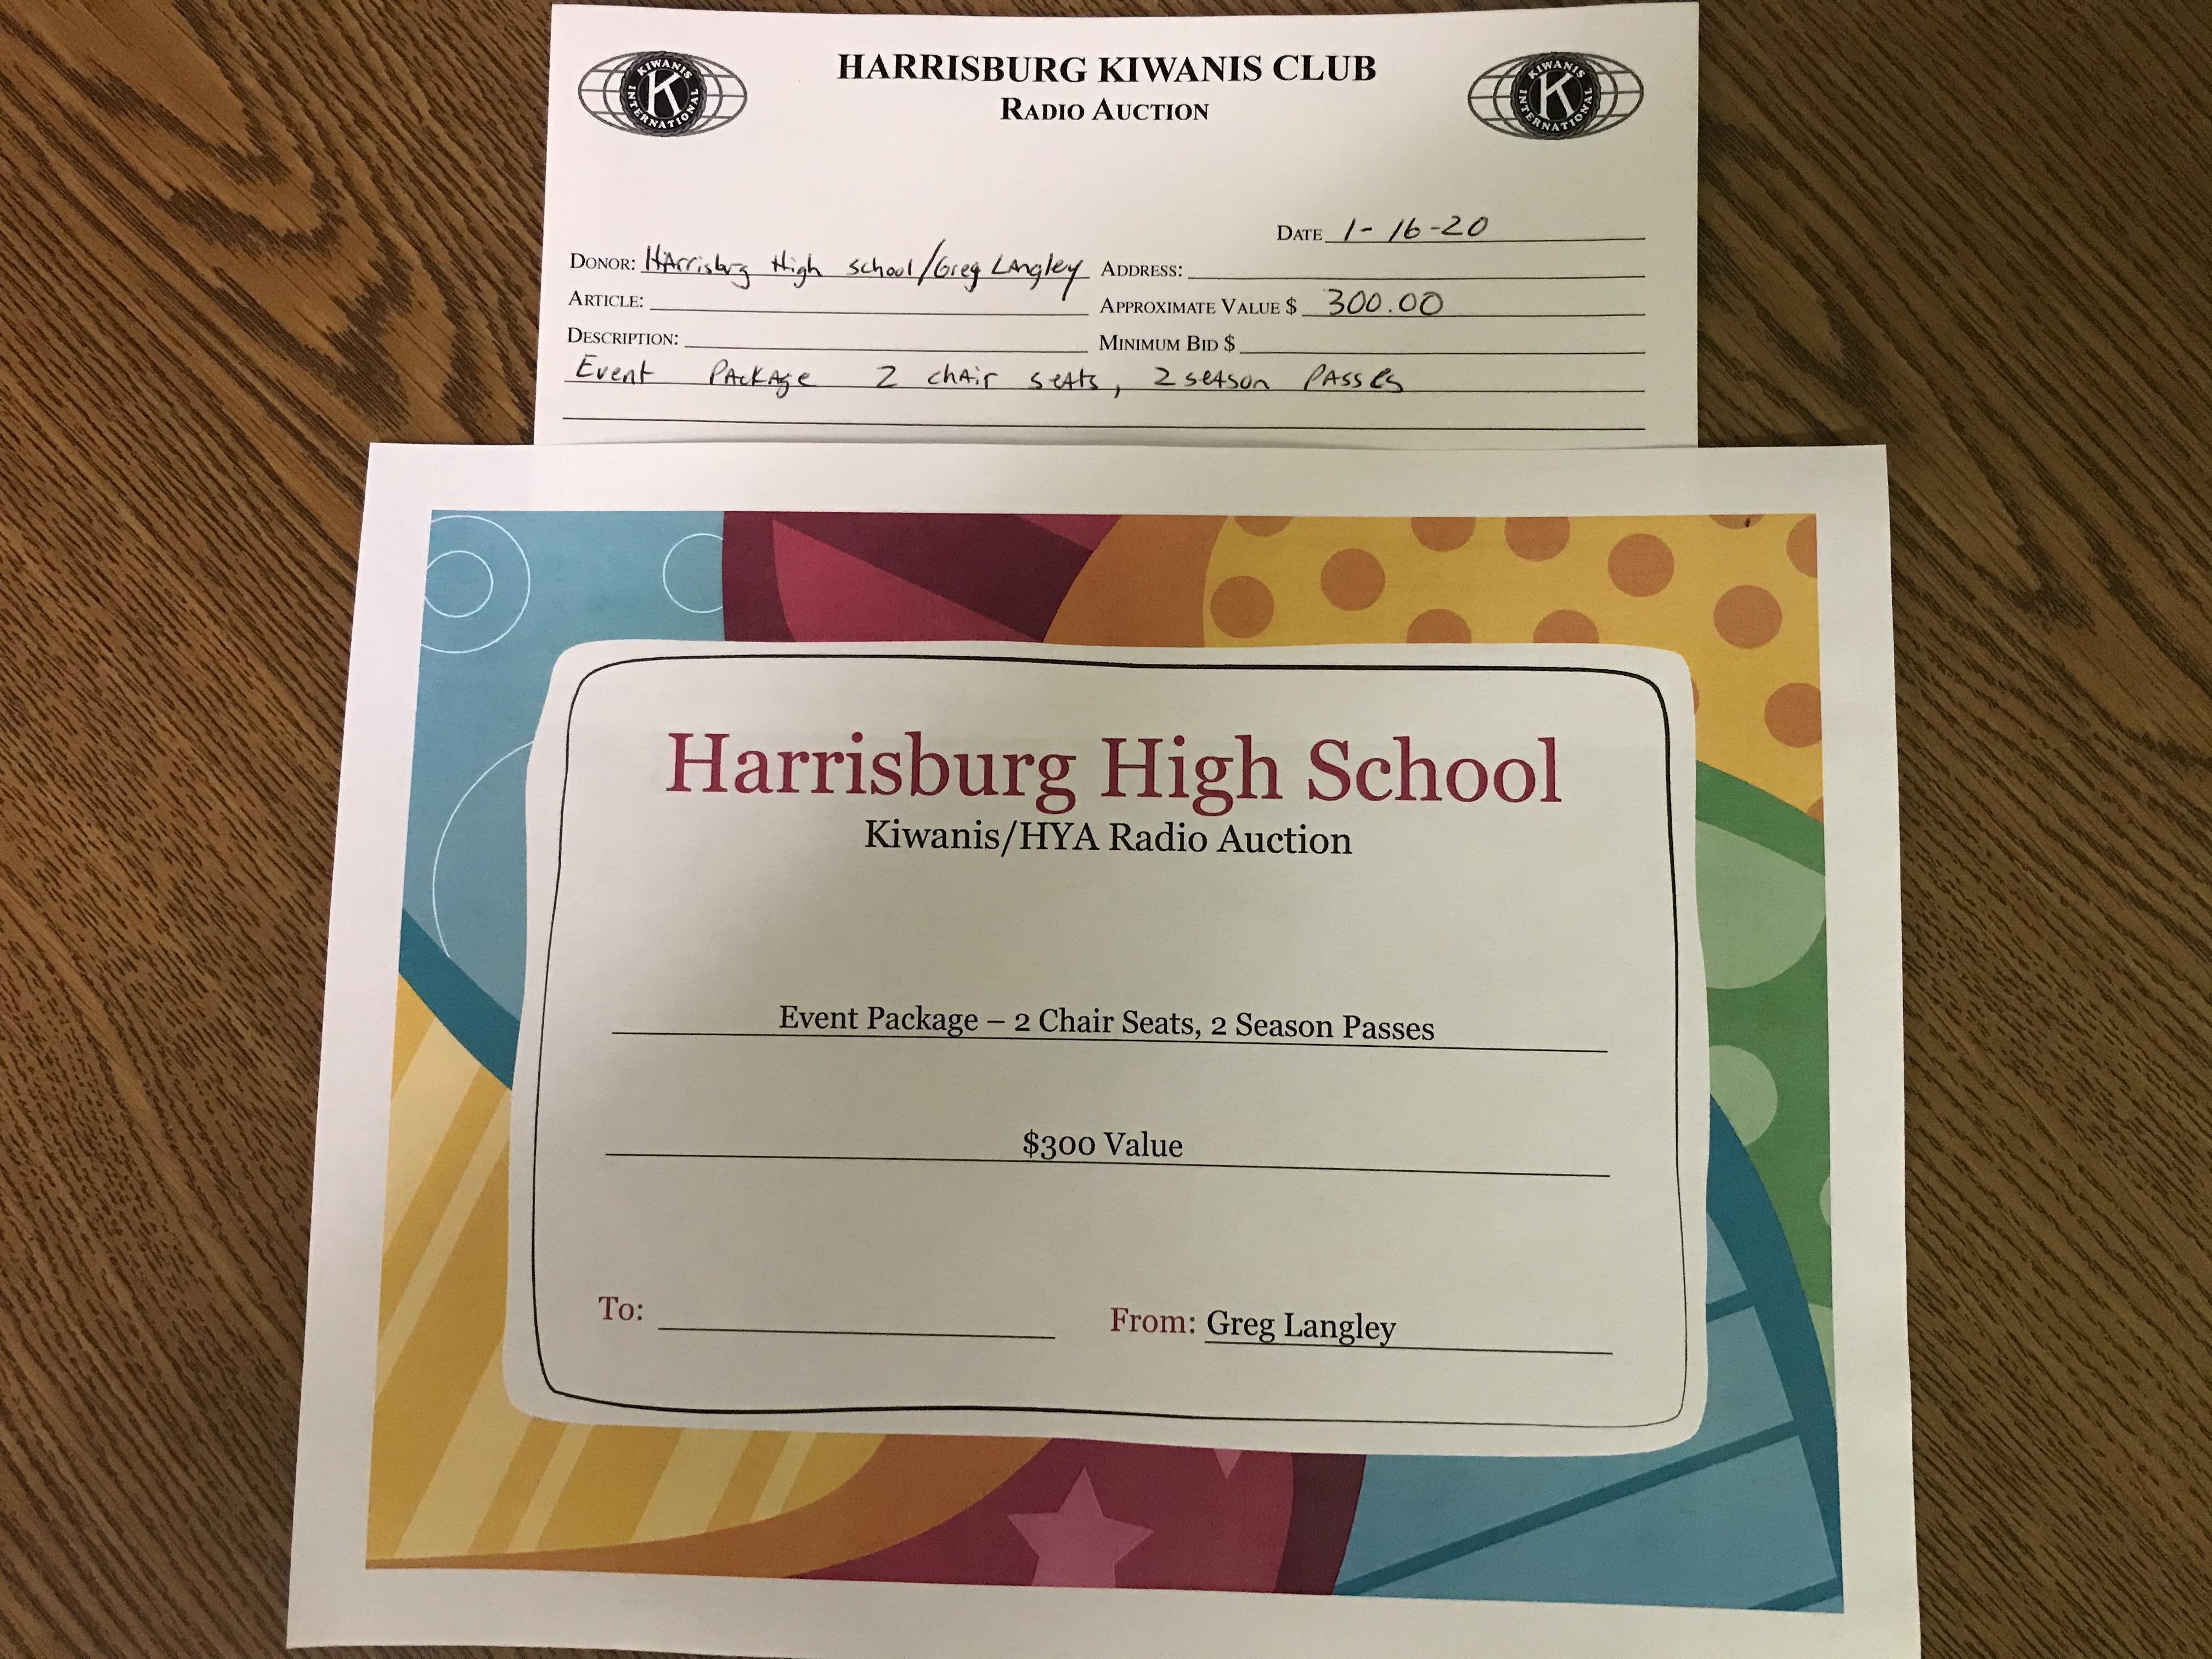 Item 504 - Harrisburg High School Event Package - 2 Season Passes, 2 Chair Seats